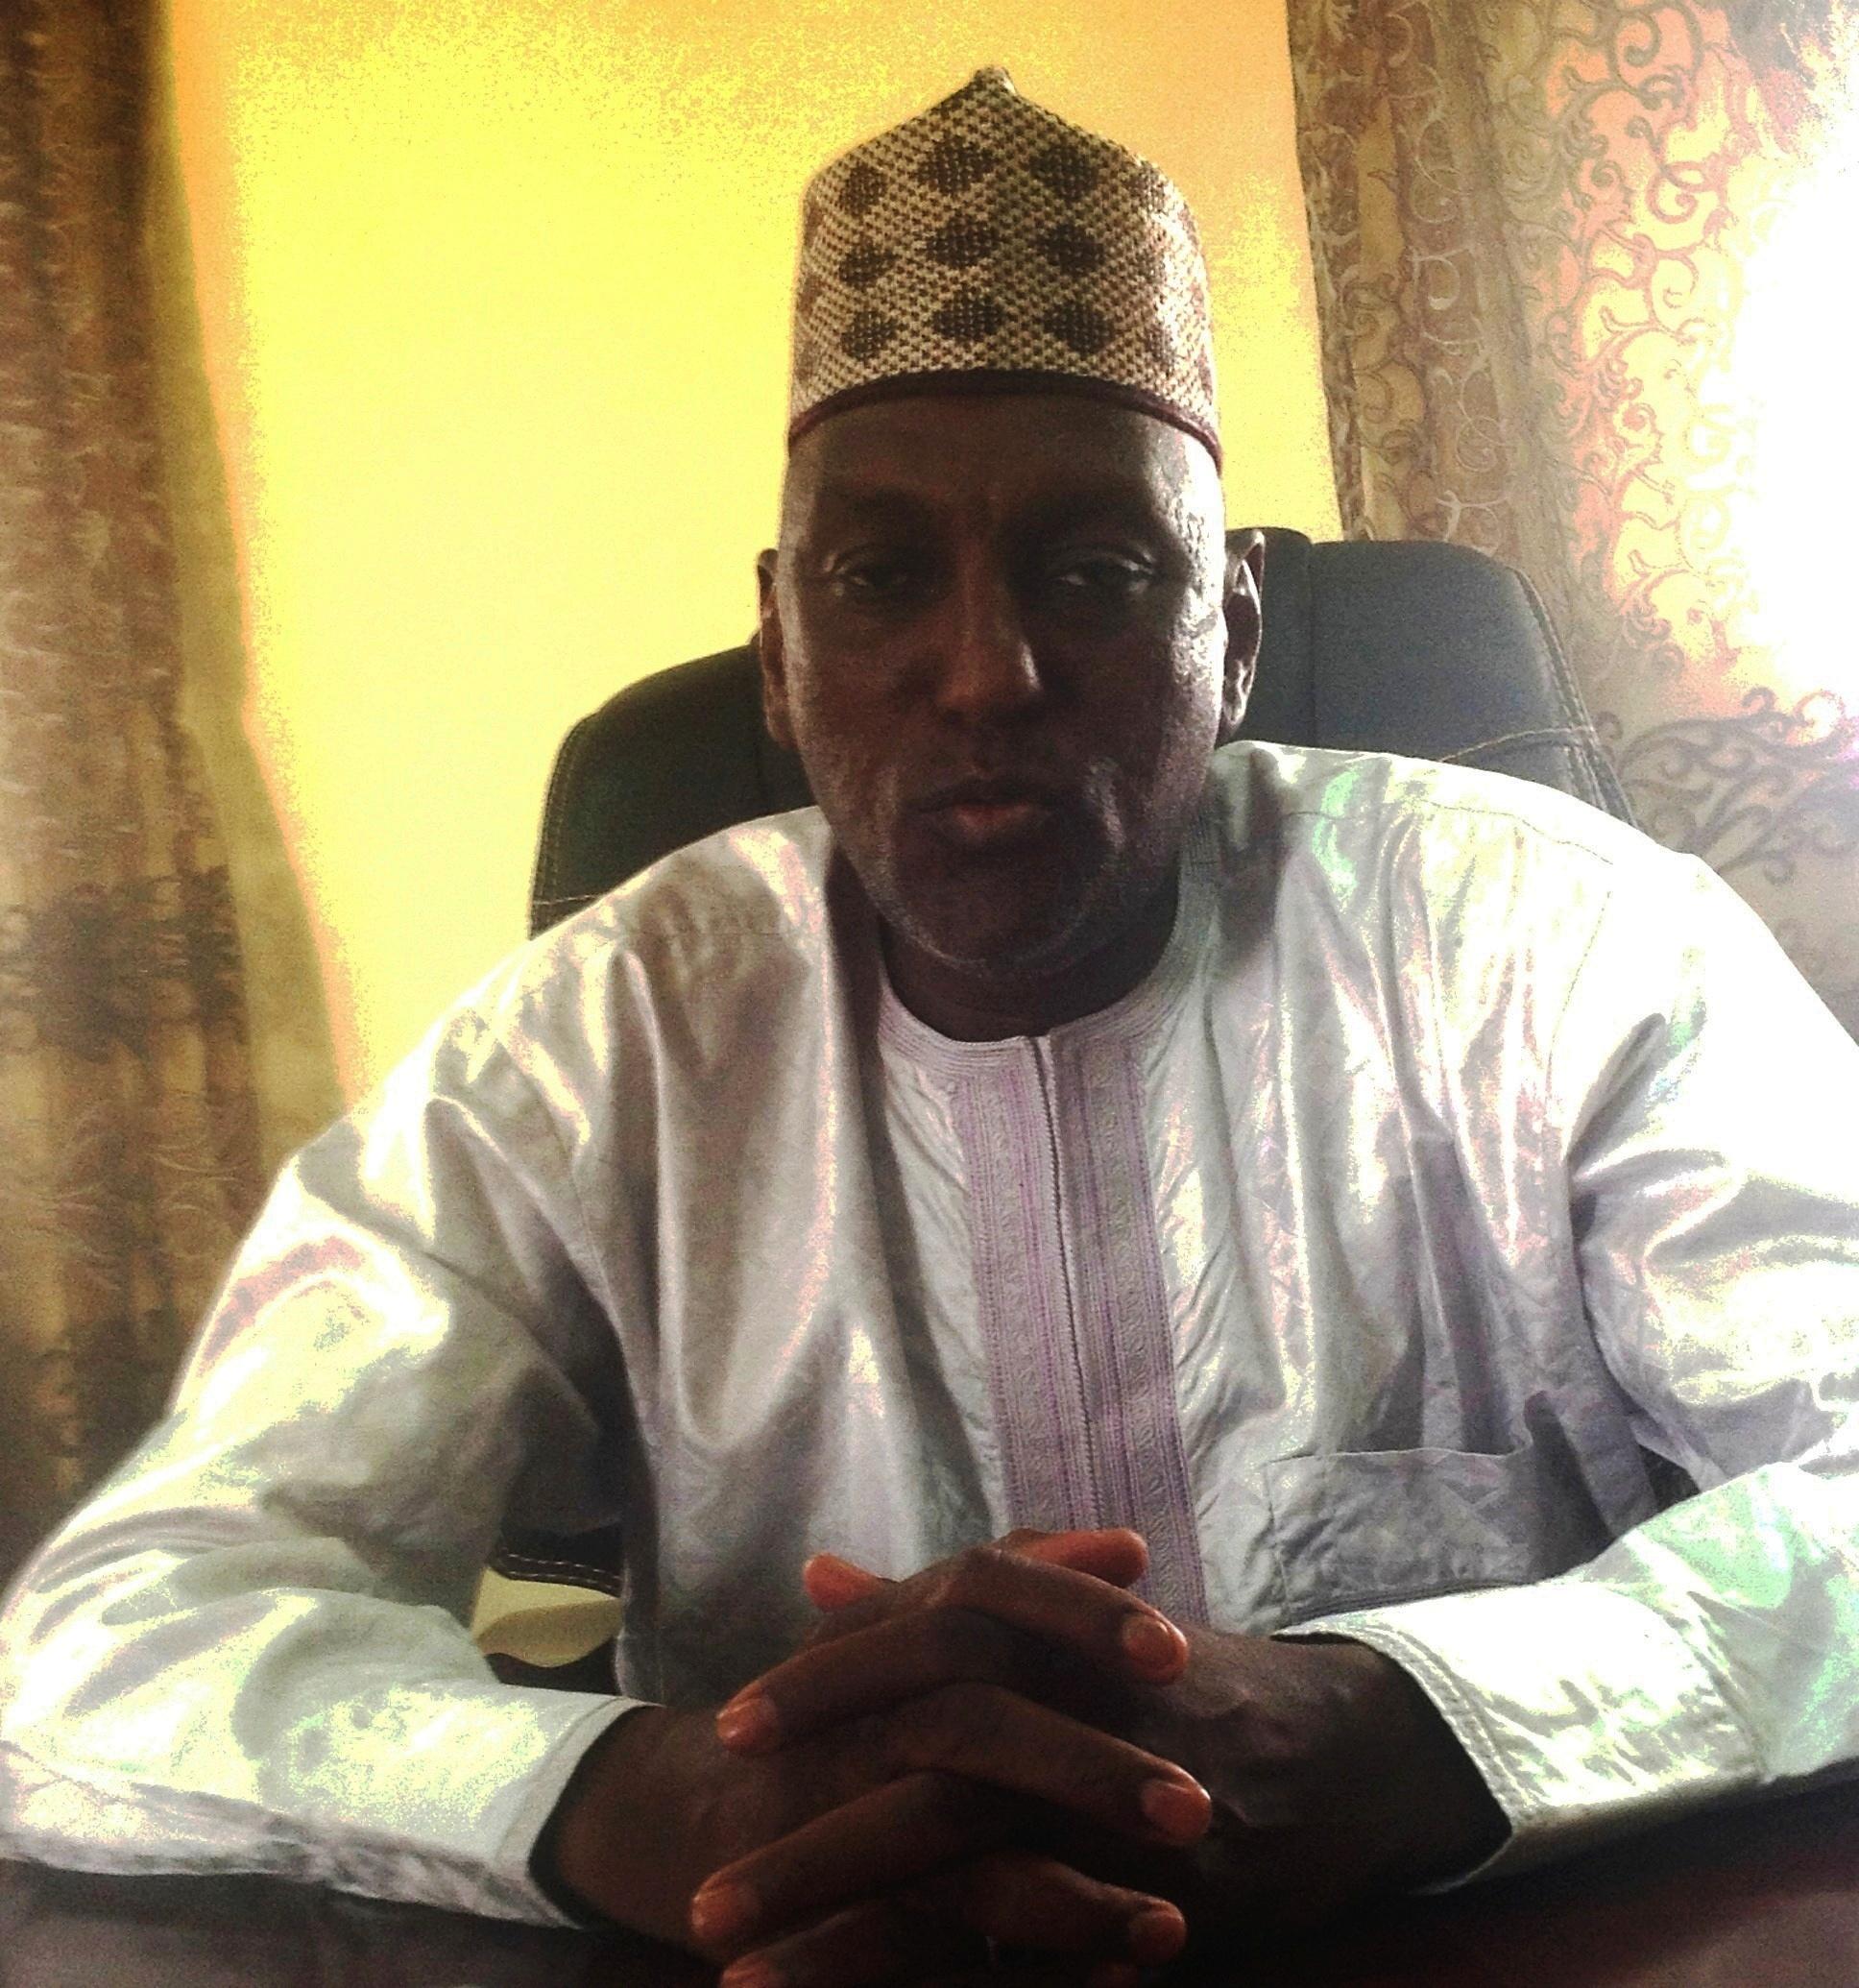 Tchad : Djibert Younous nommé gouverneur de la province du Moyen-Chari. © Alwihda Info